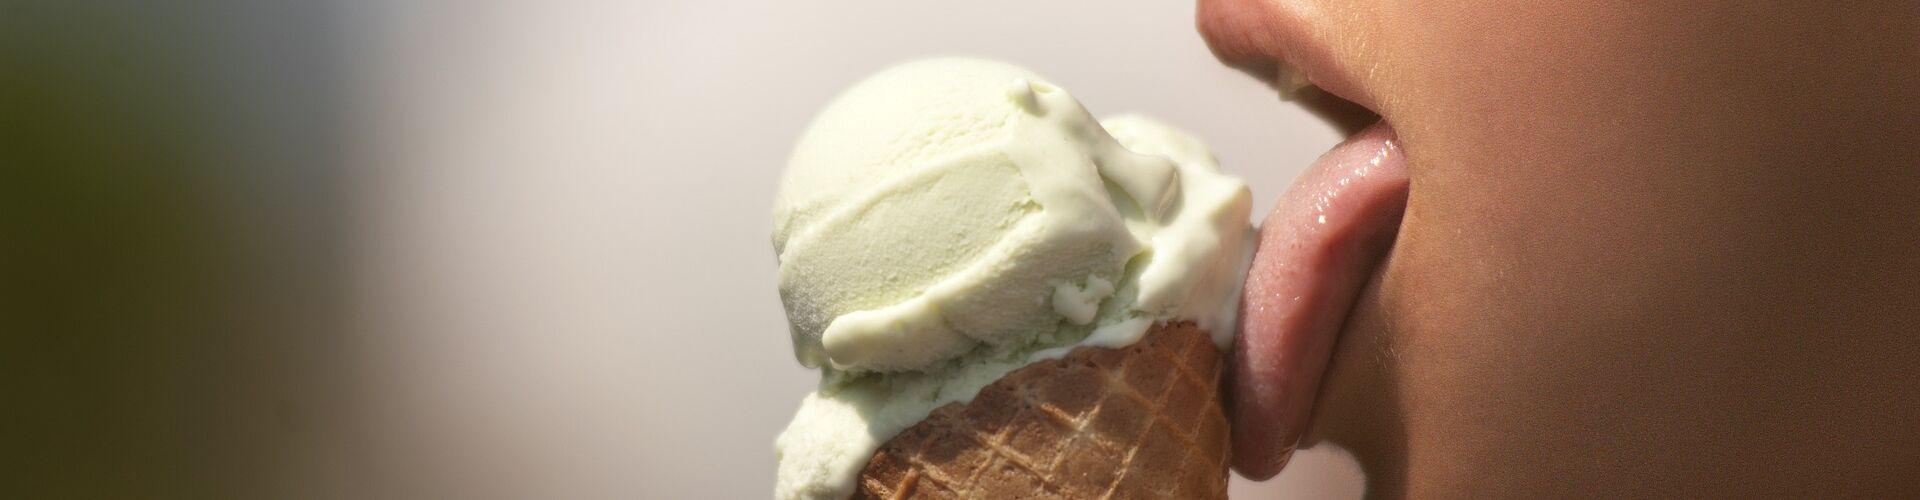 ice-cream-2588541_1920